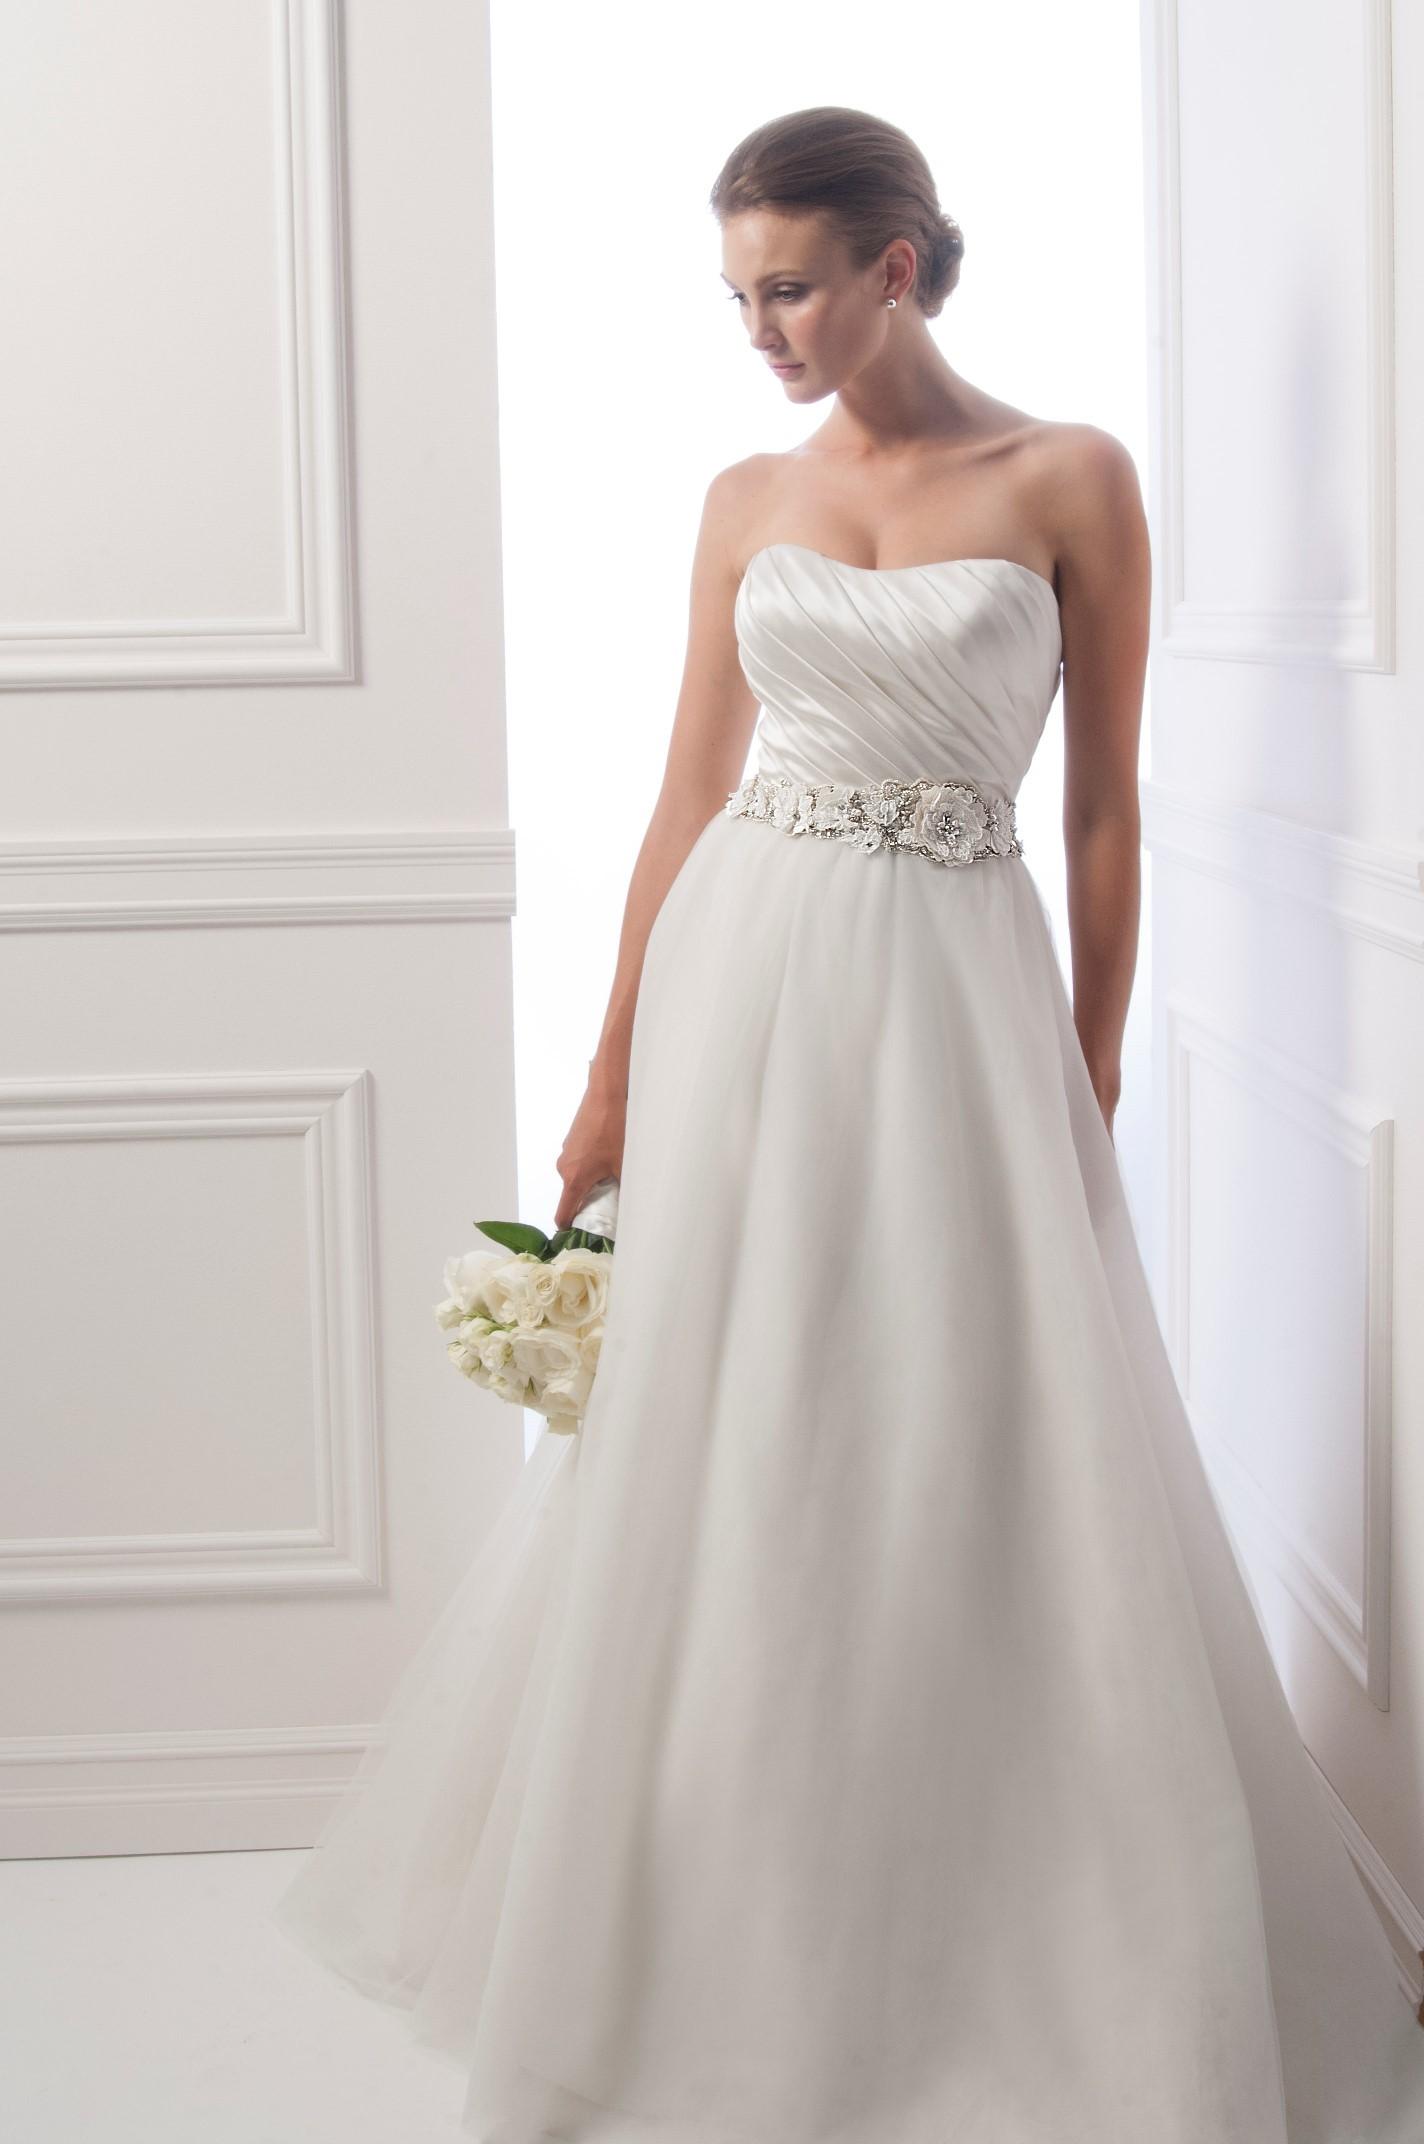 dress alfred sung fall 2013 bridal 6935 alfredsung bridal. Black Bedroom Furniture Sets. Home Design Ideas